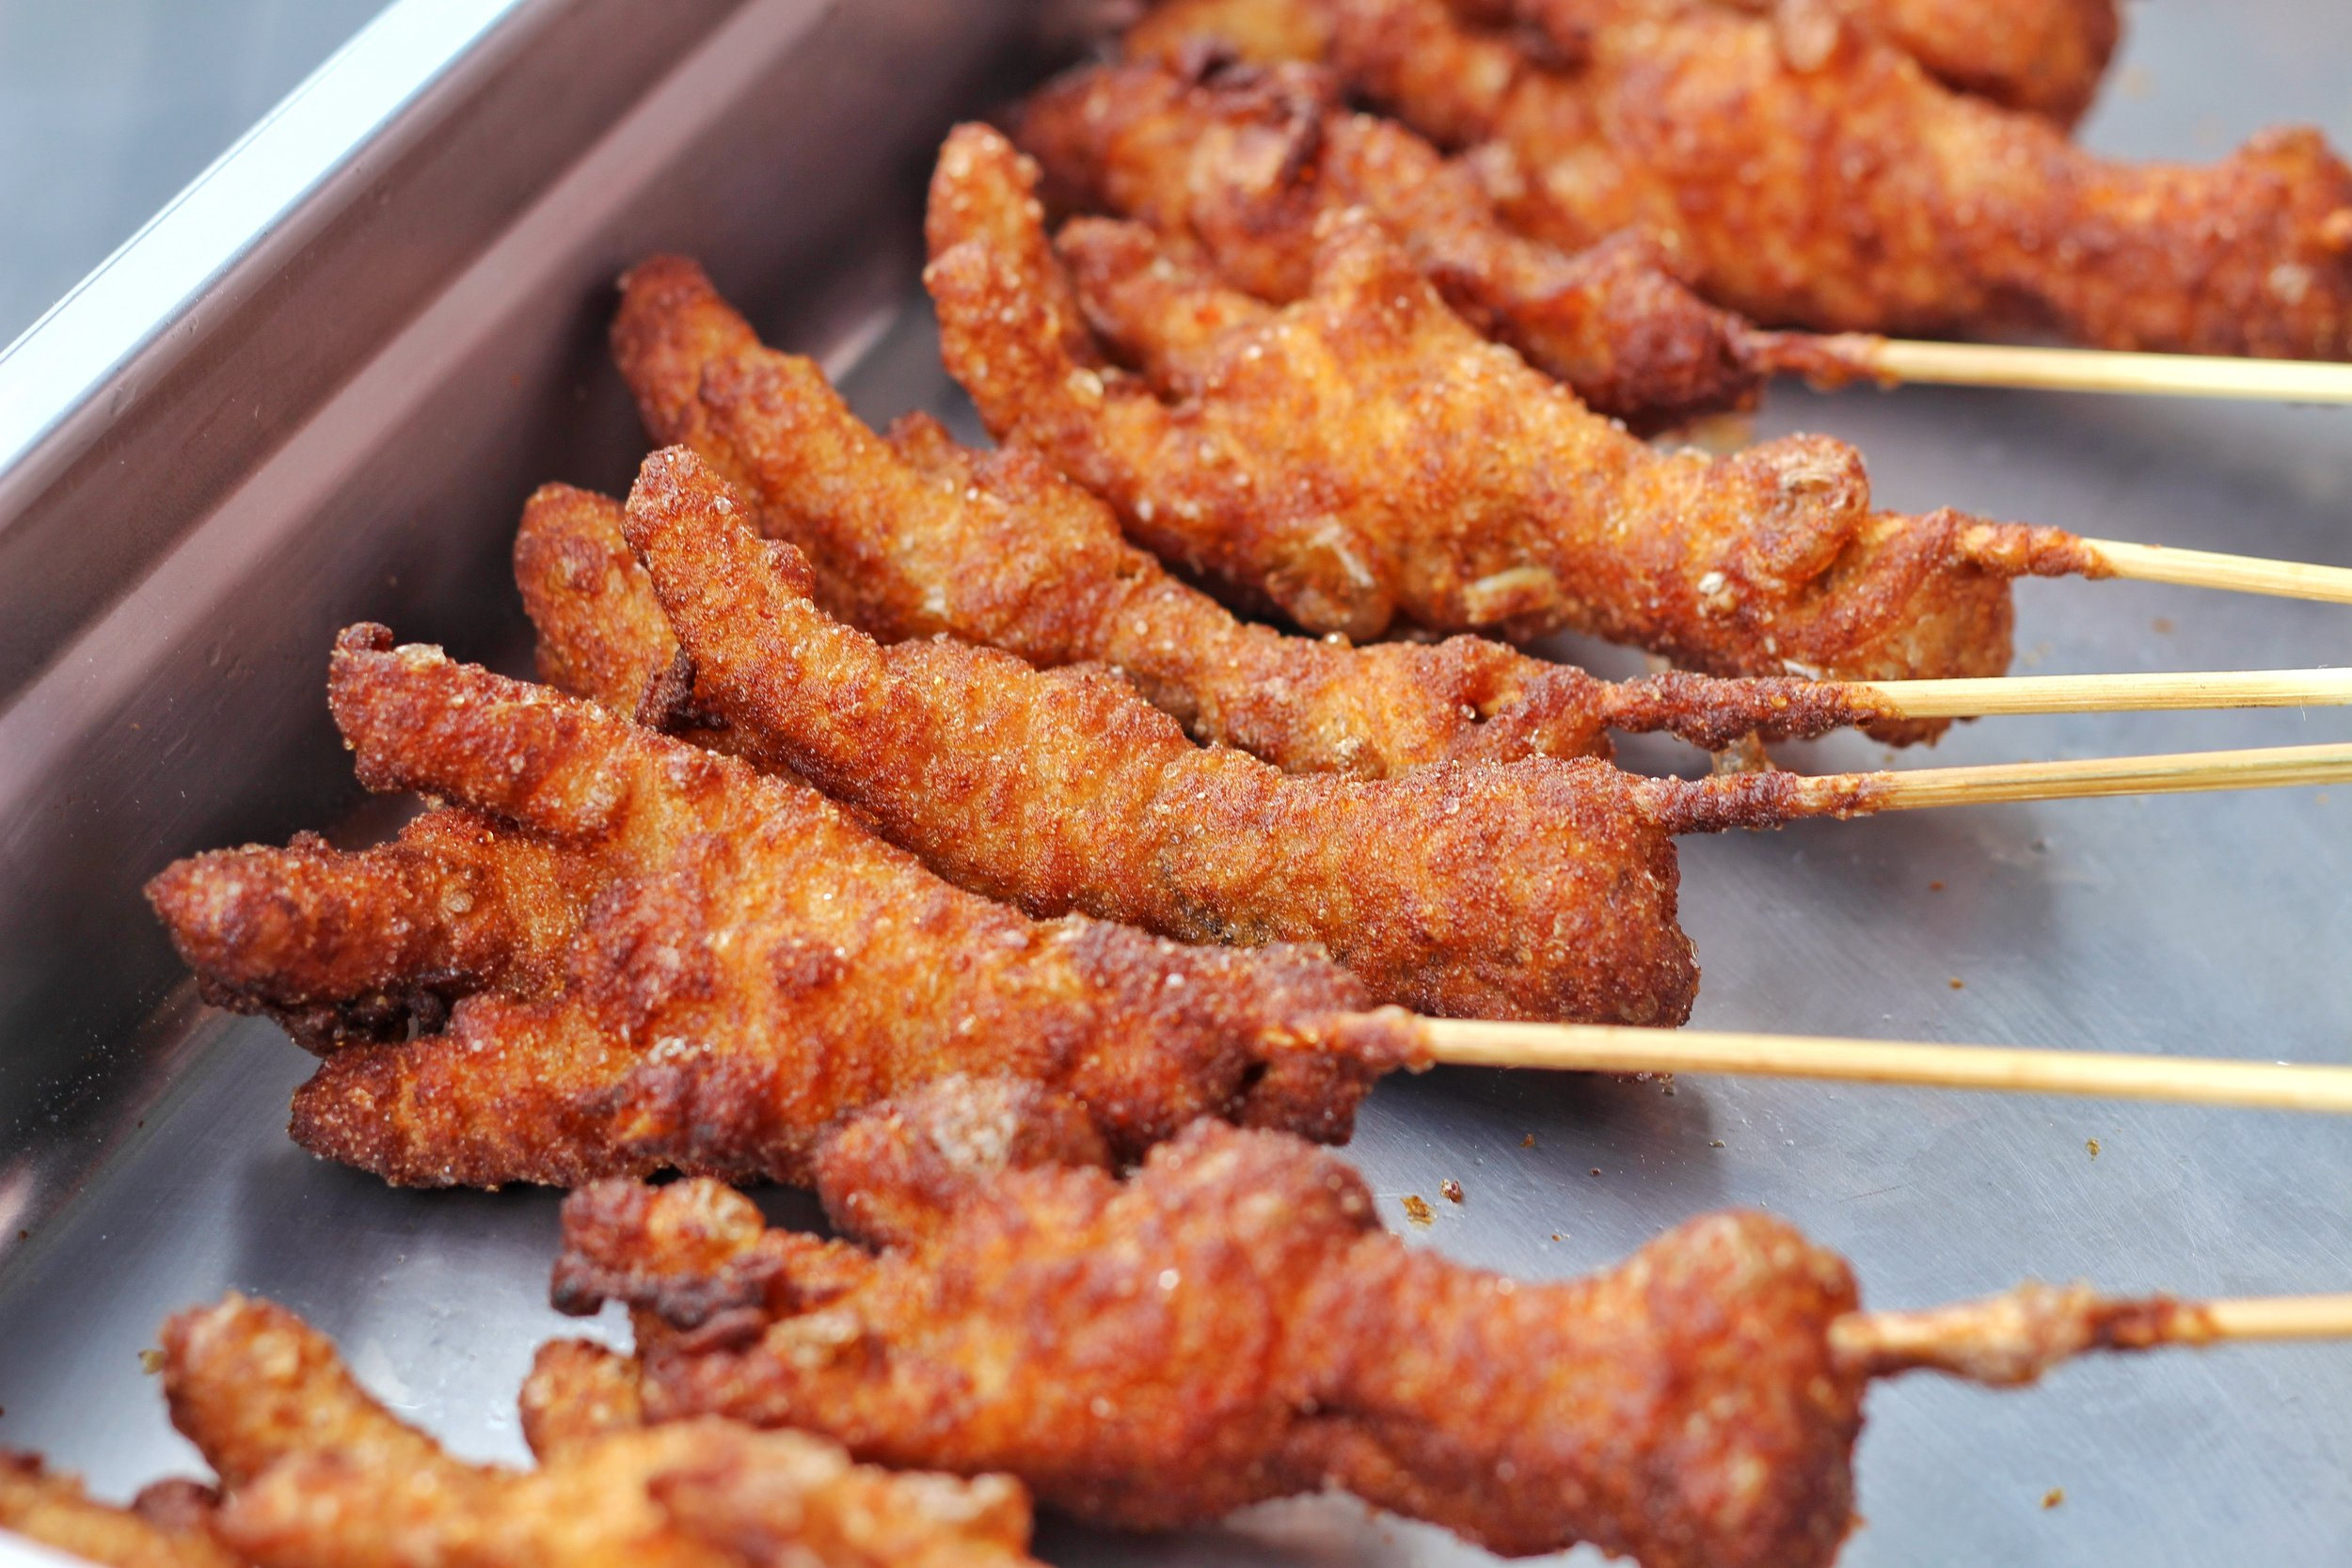 Crispy chicken feet served on a stick.